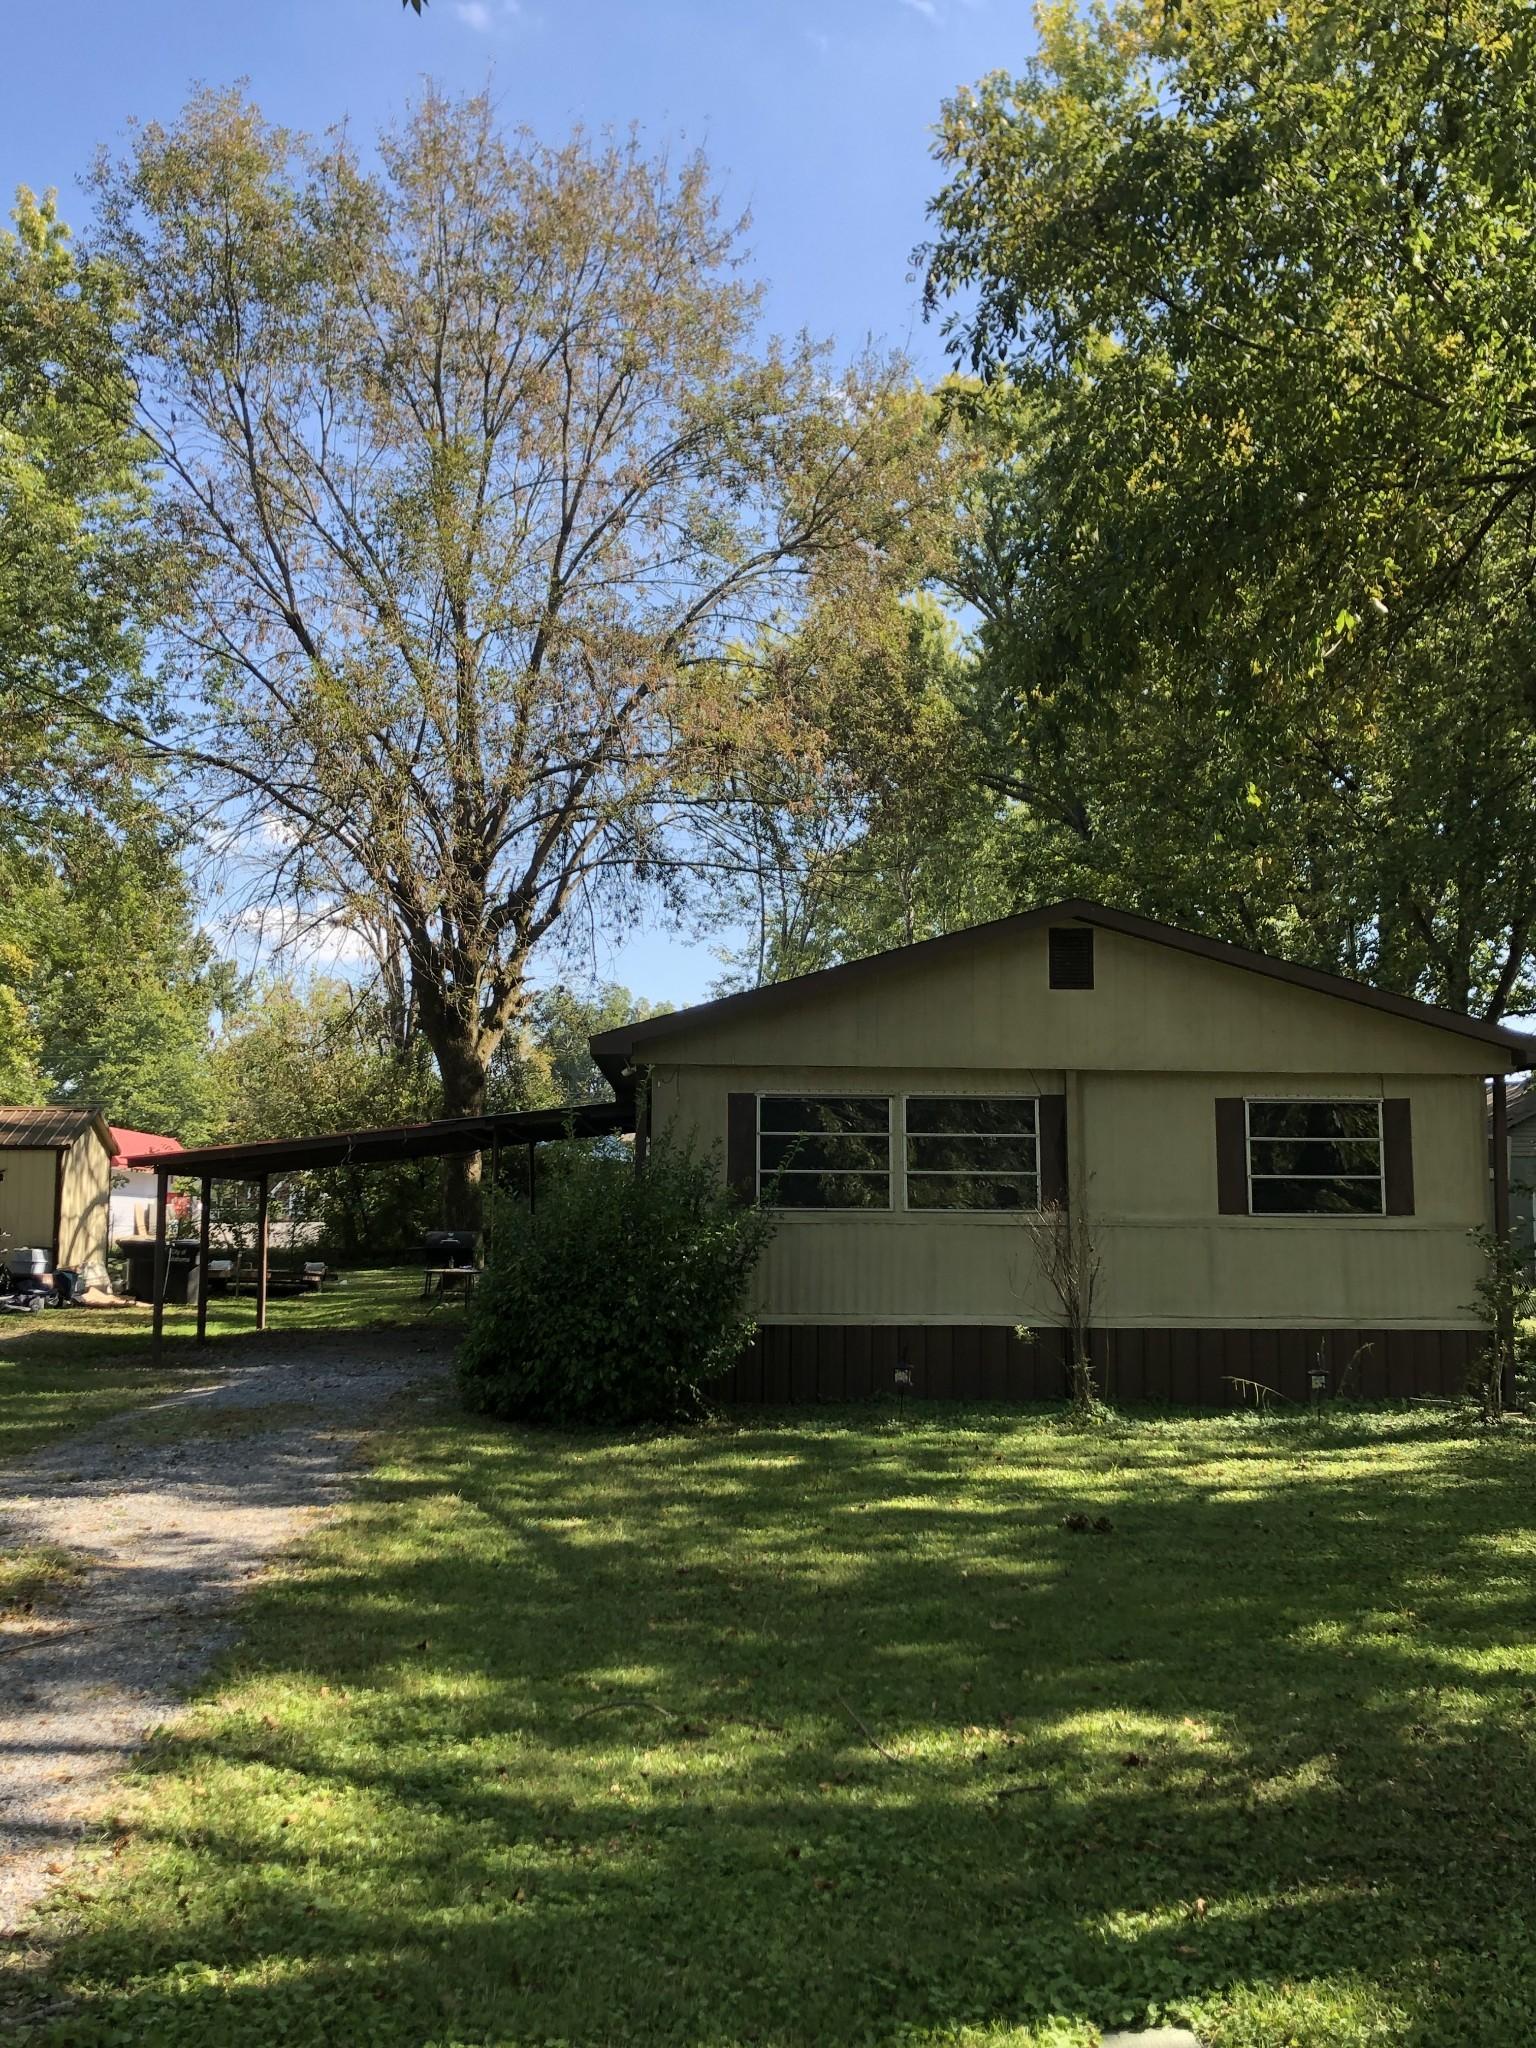 808 E Grundy St Property Photo - Tullahoma, TN real estate listing